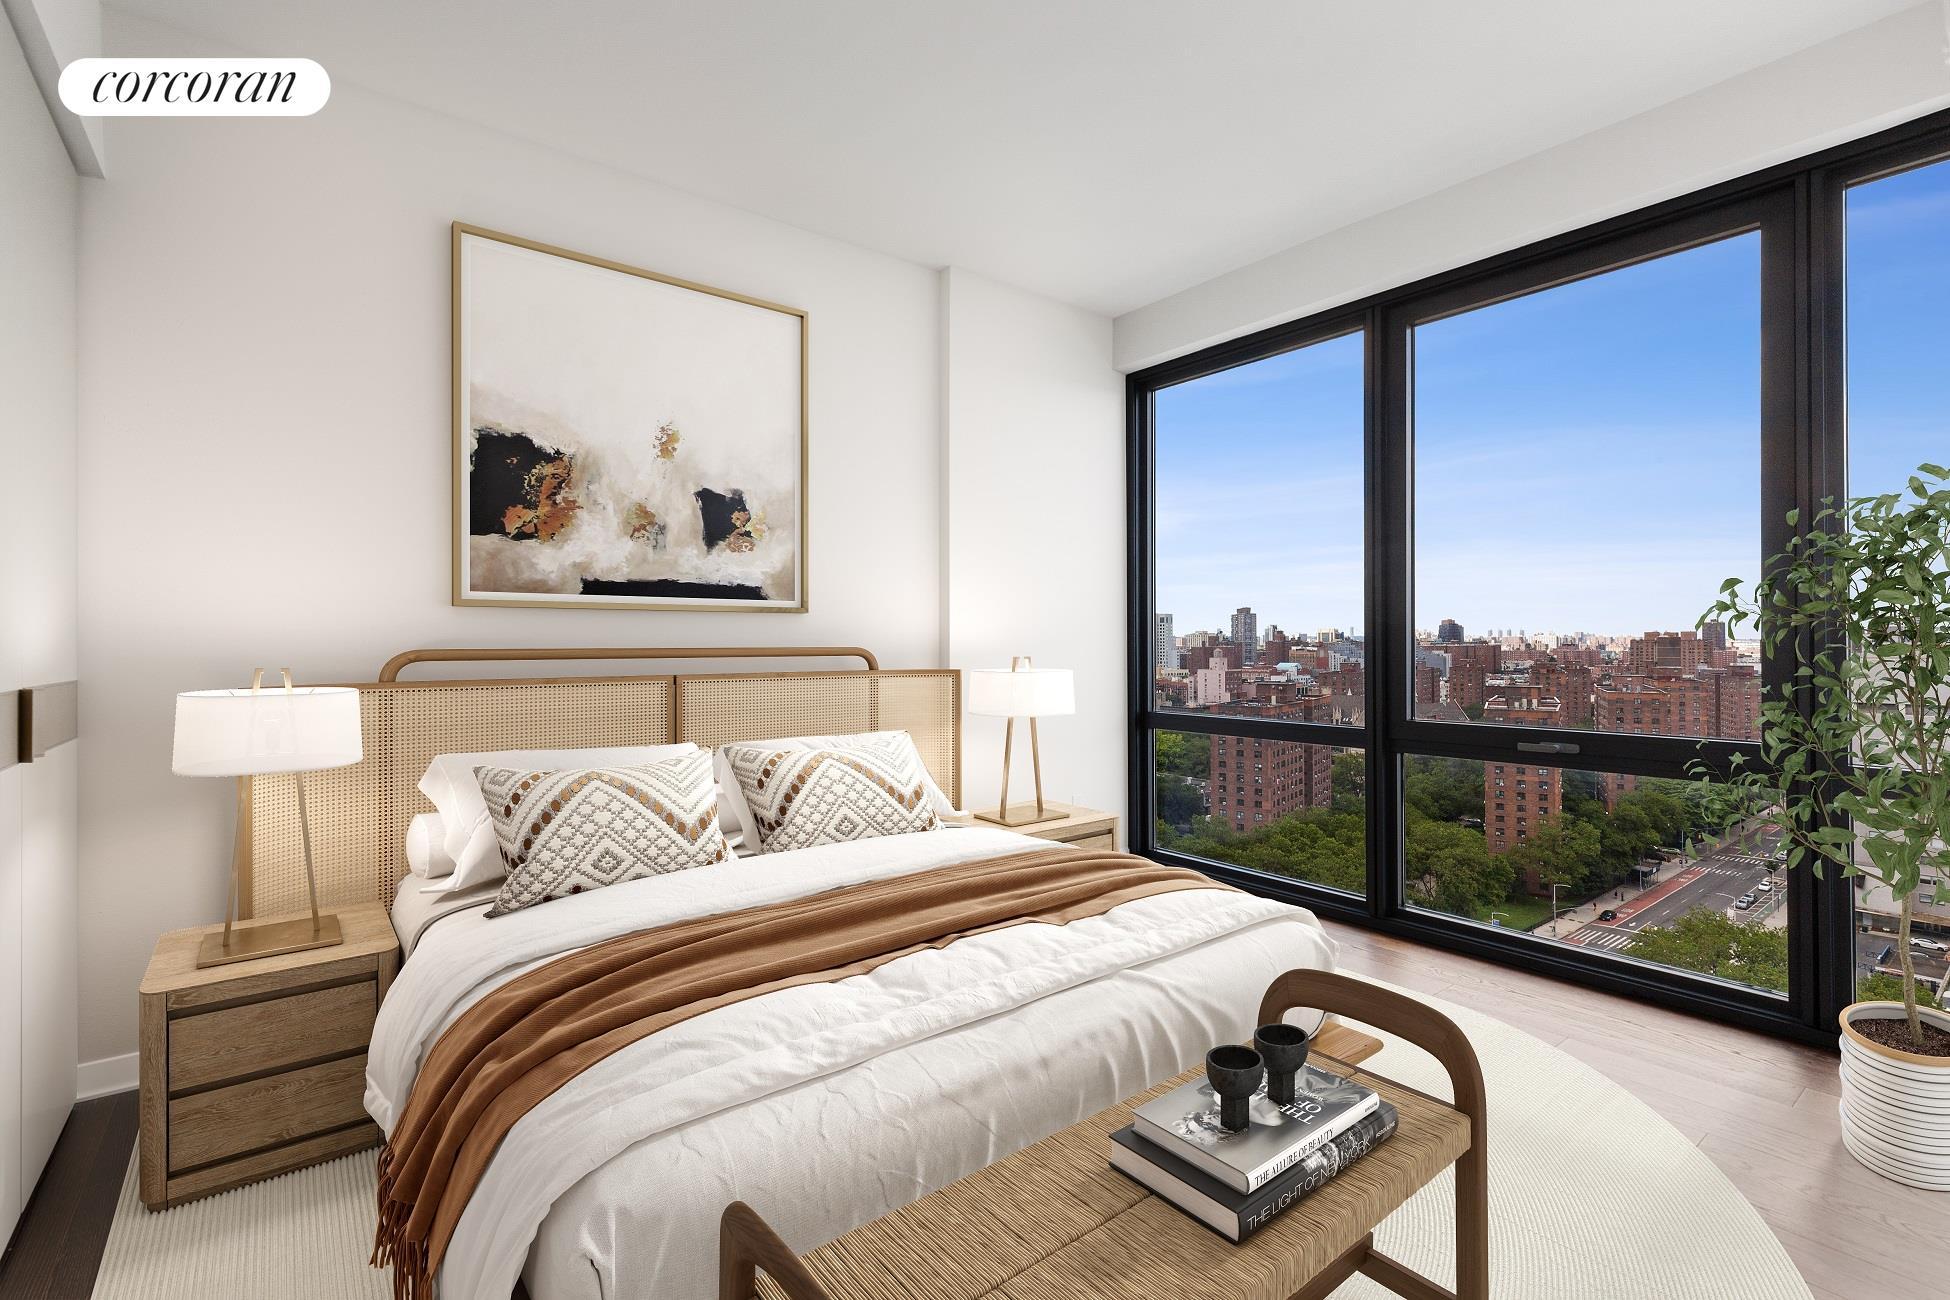 302 East 96th Street Upper East Side New York NY 10128